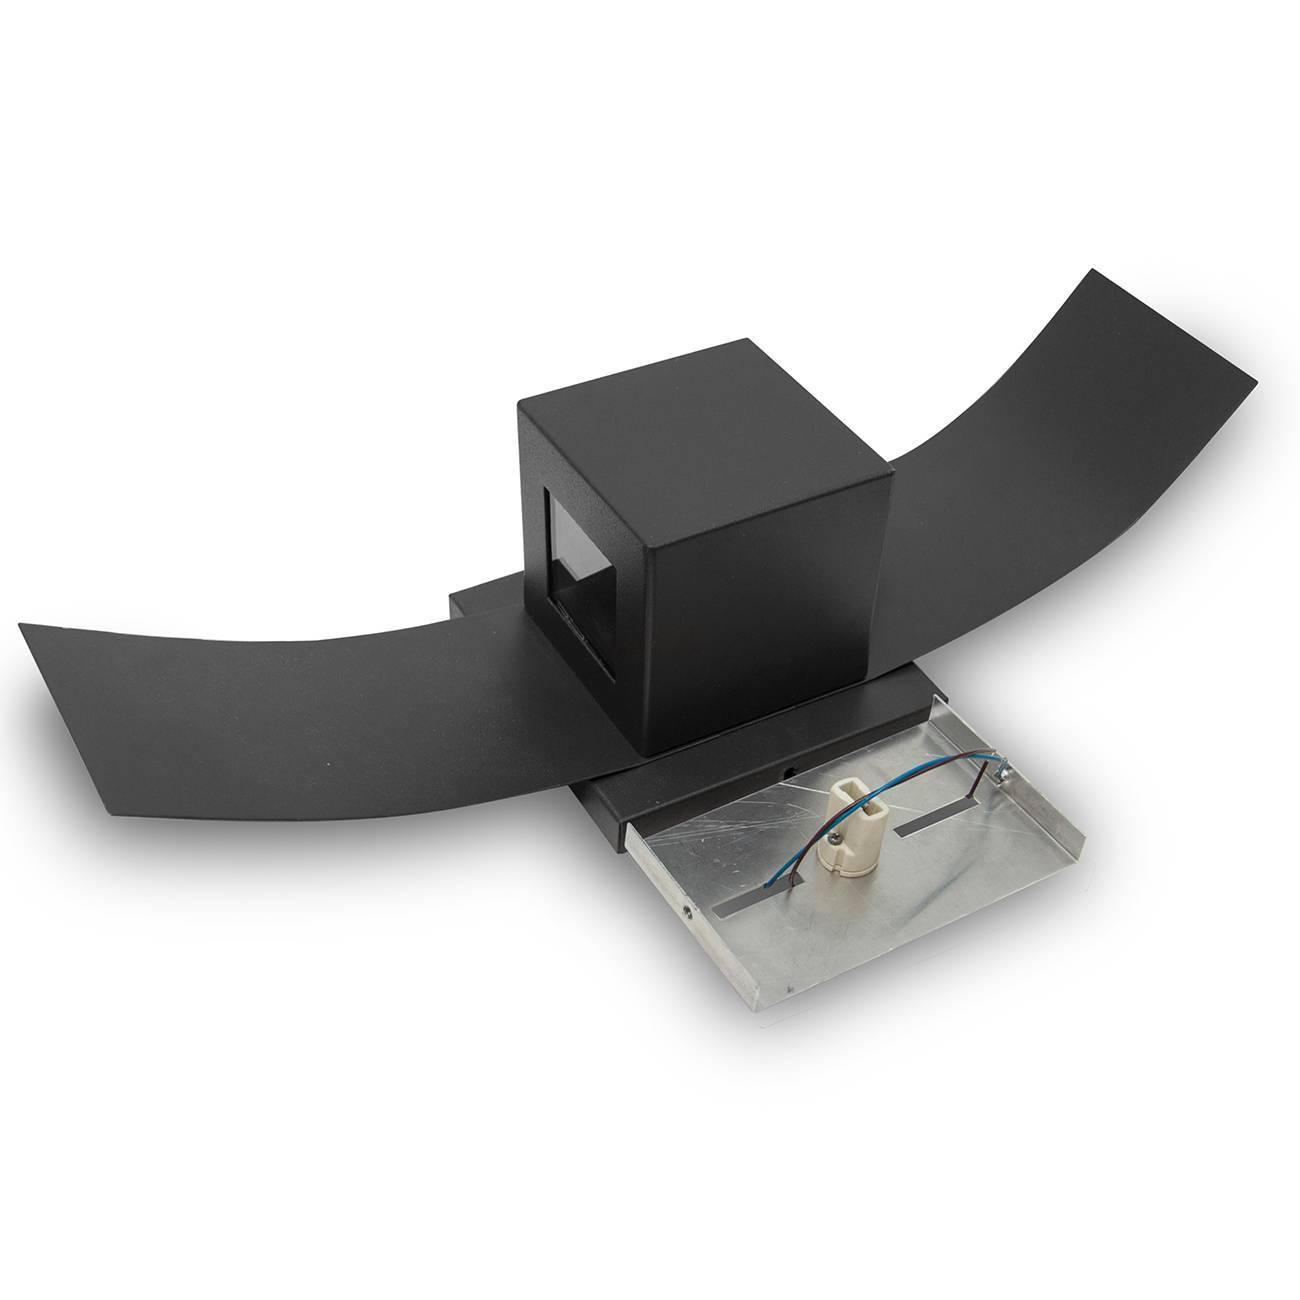 Arandela Box Com Aba 2 Focos Preta - LCGELETRO